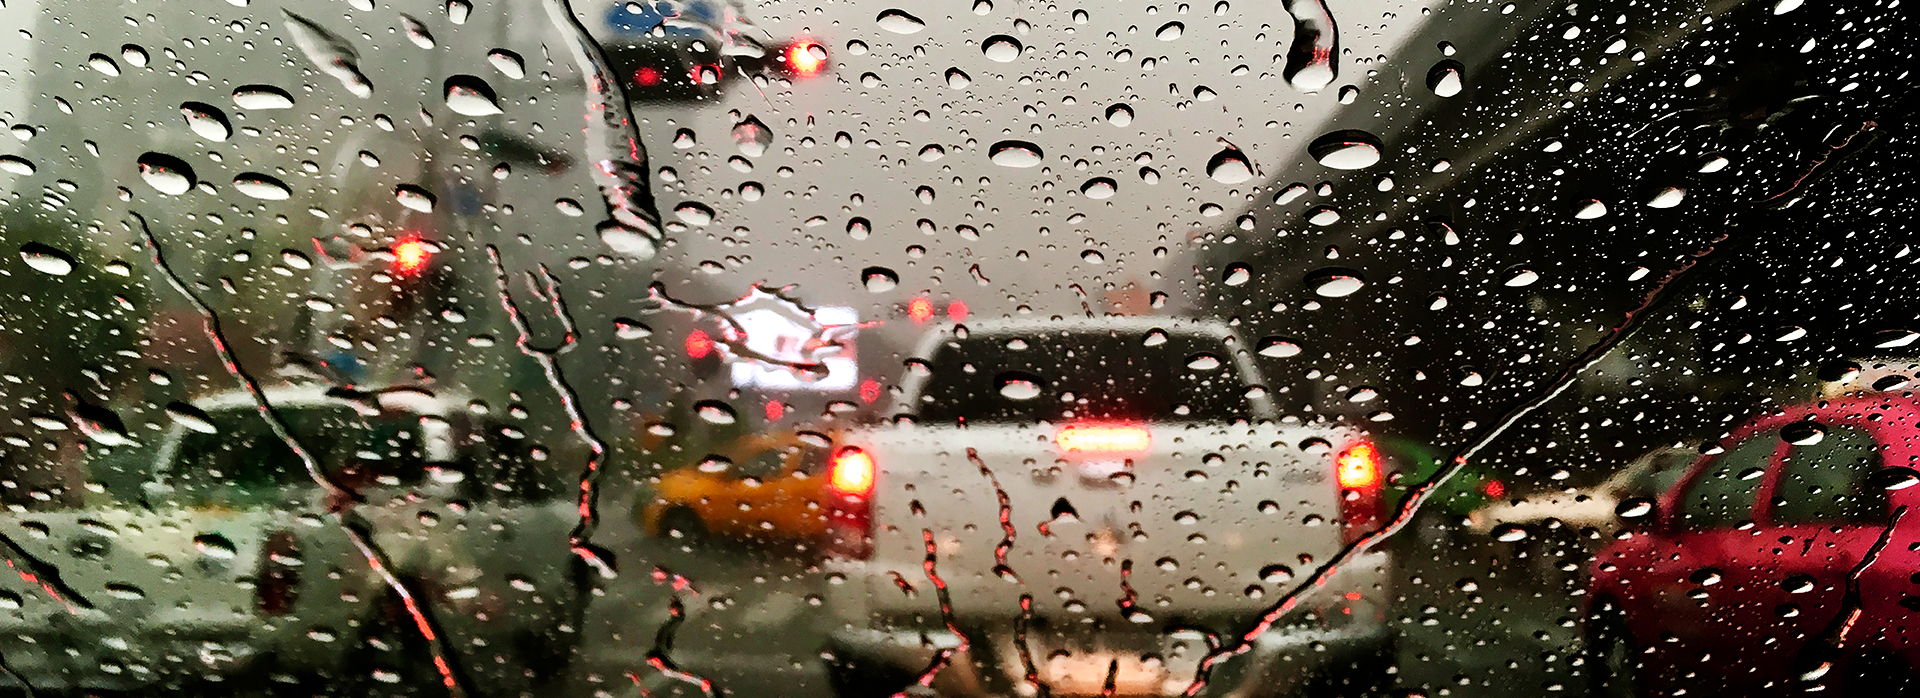 Article_rain now.jpg